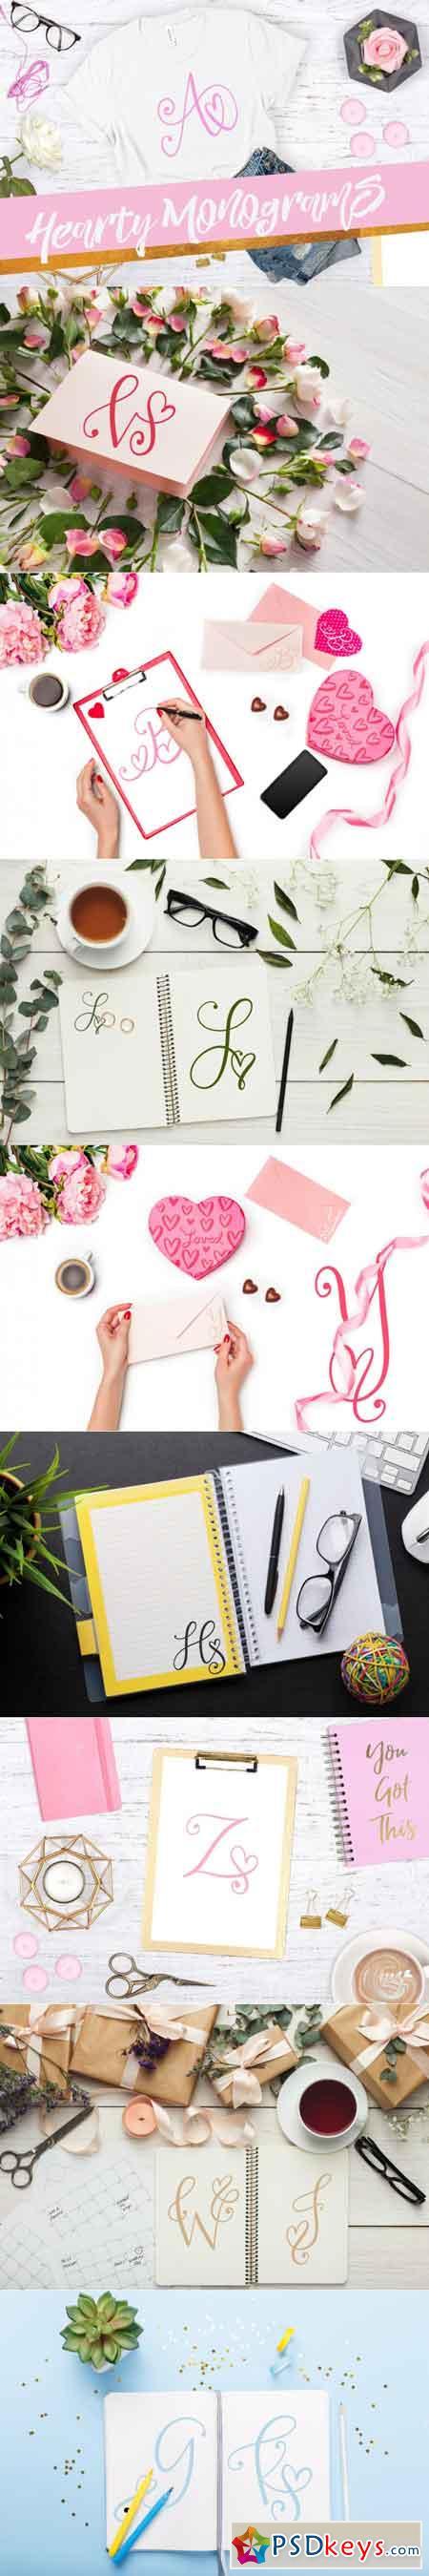 Hearty Monograms - Hand Lettered Monogram Font 3474809